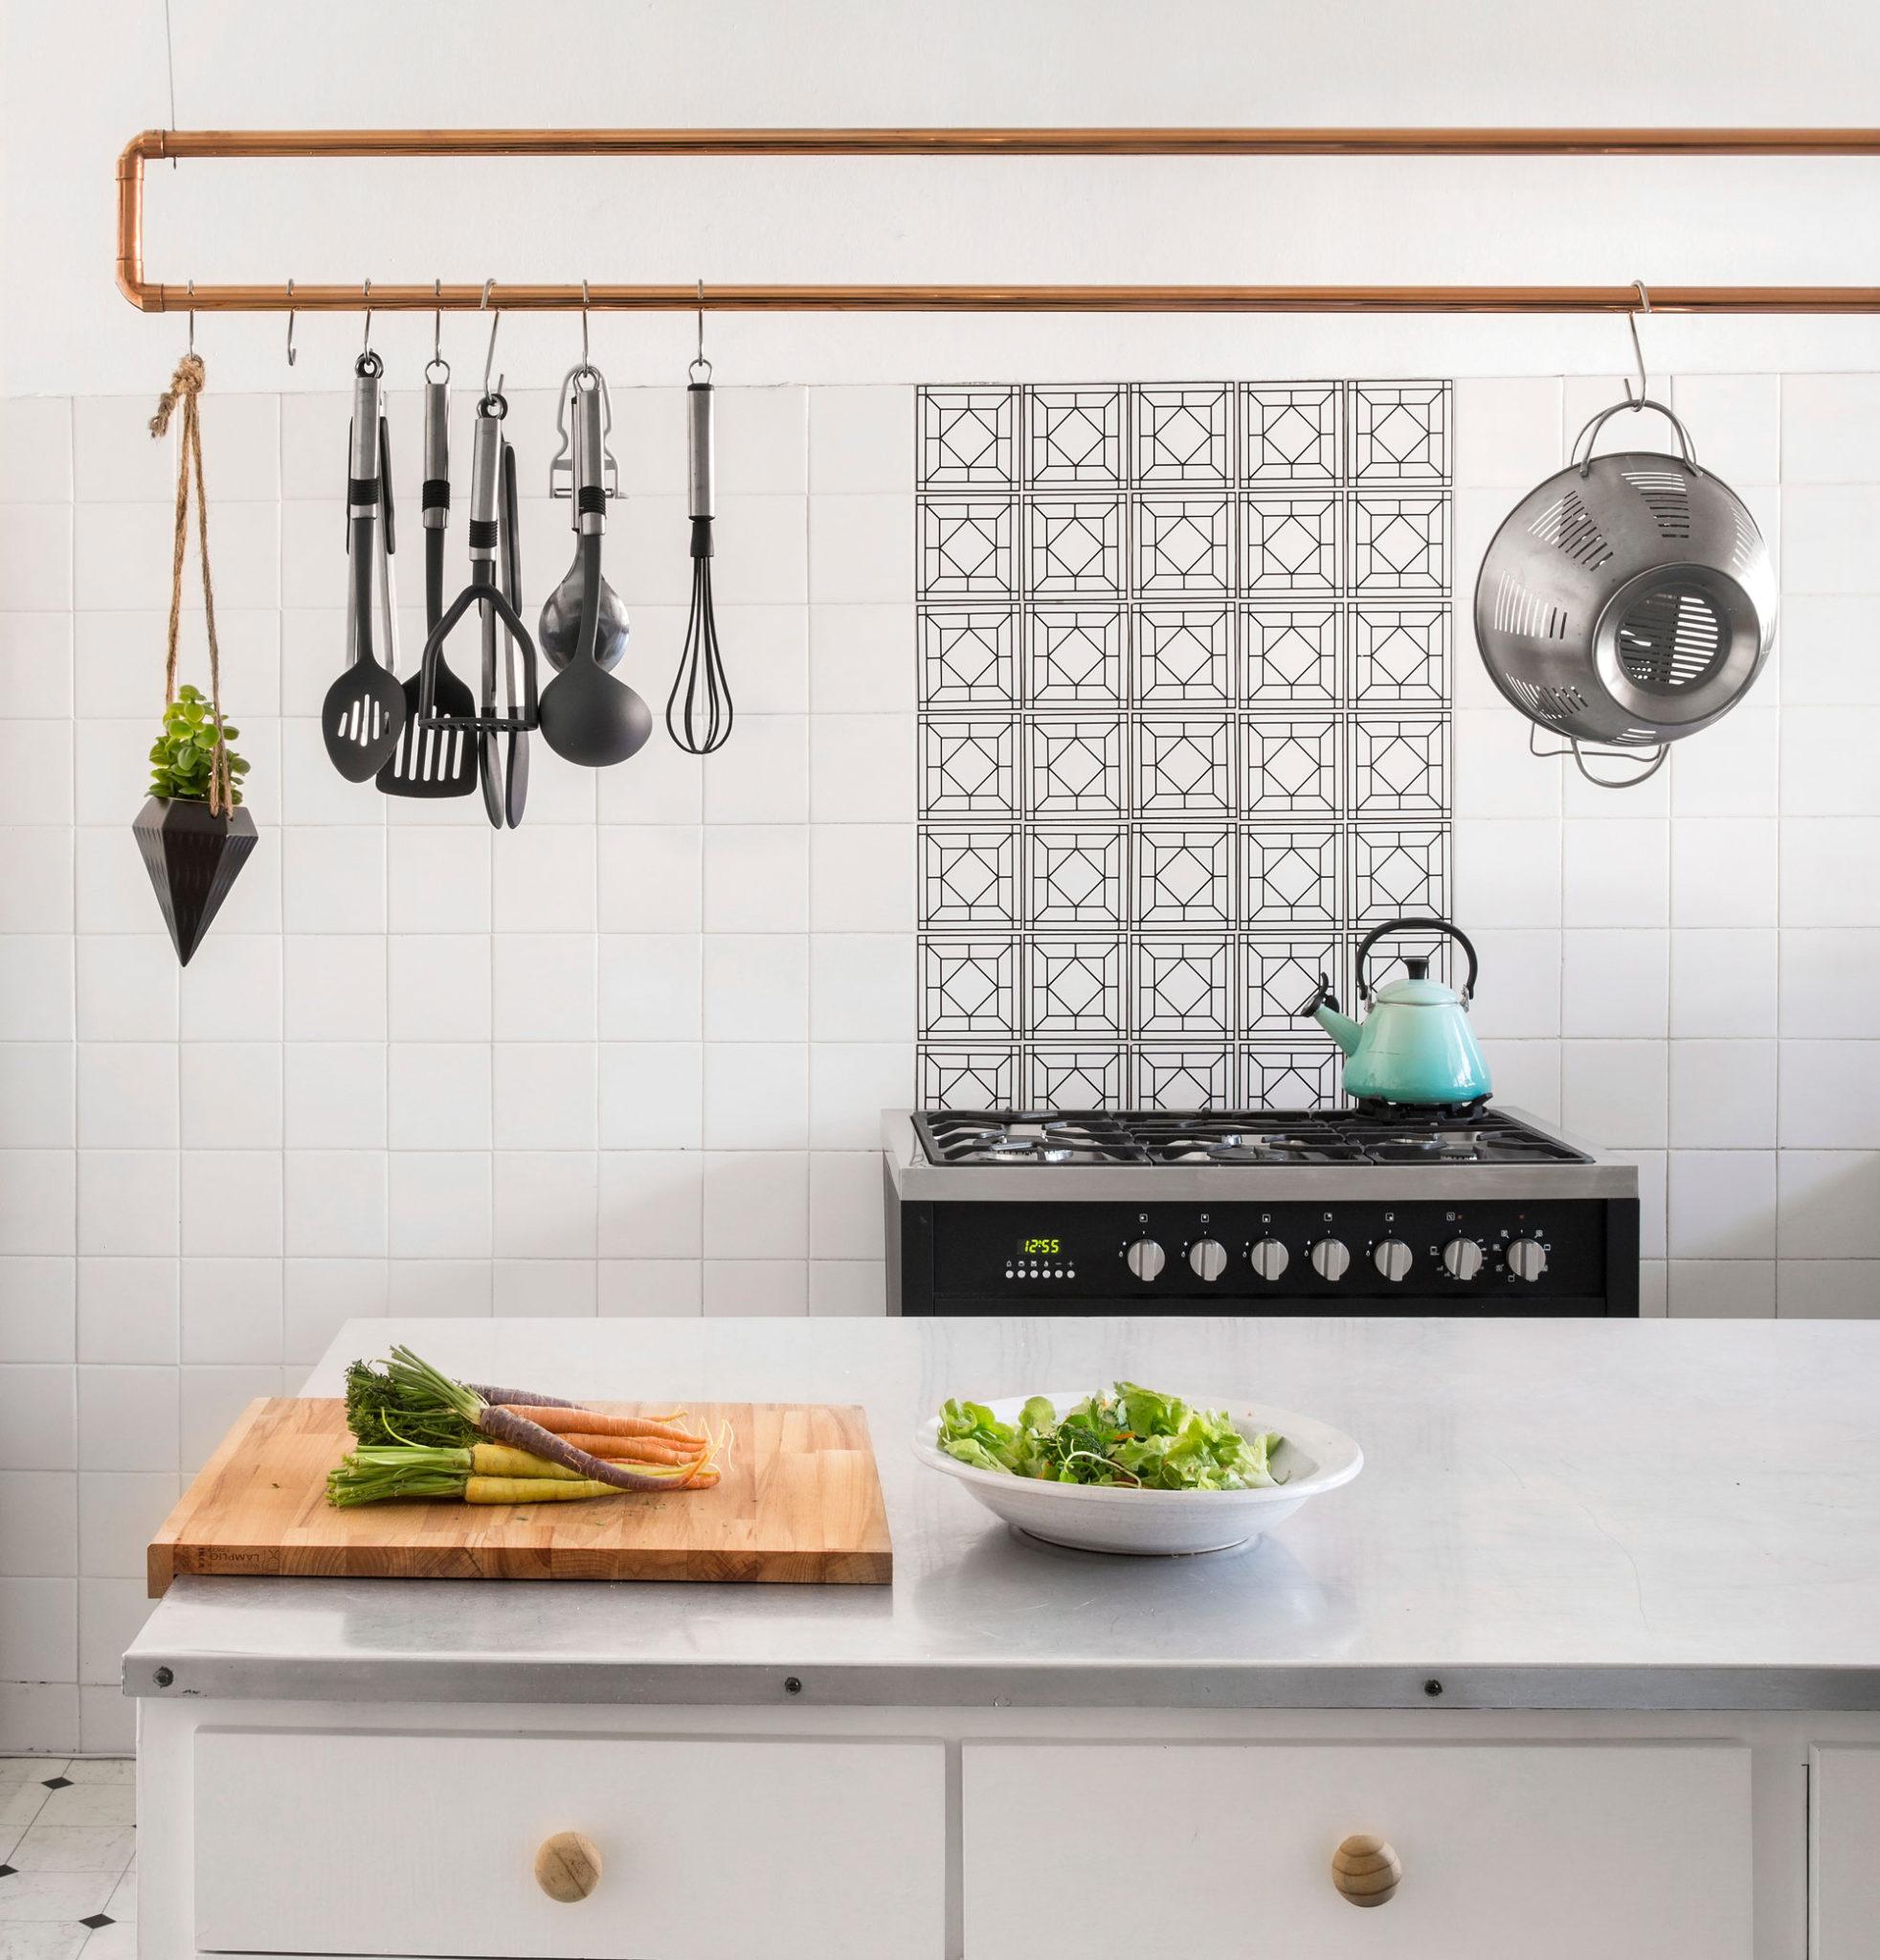 Sa Kitchen Designs: DIY: Make A Pot Rack From Copper Piping